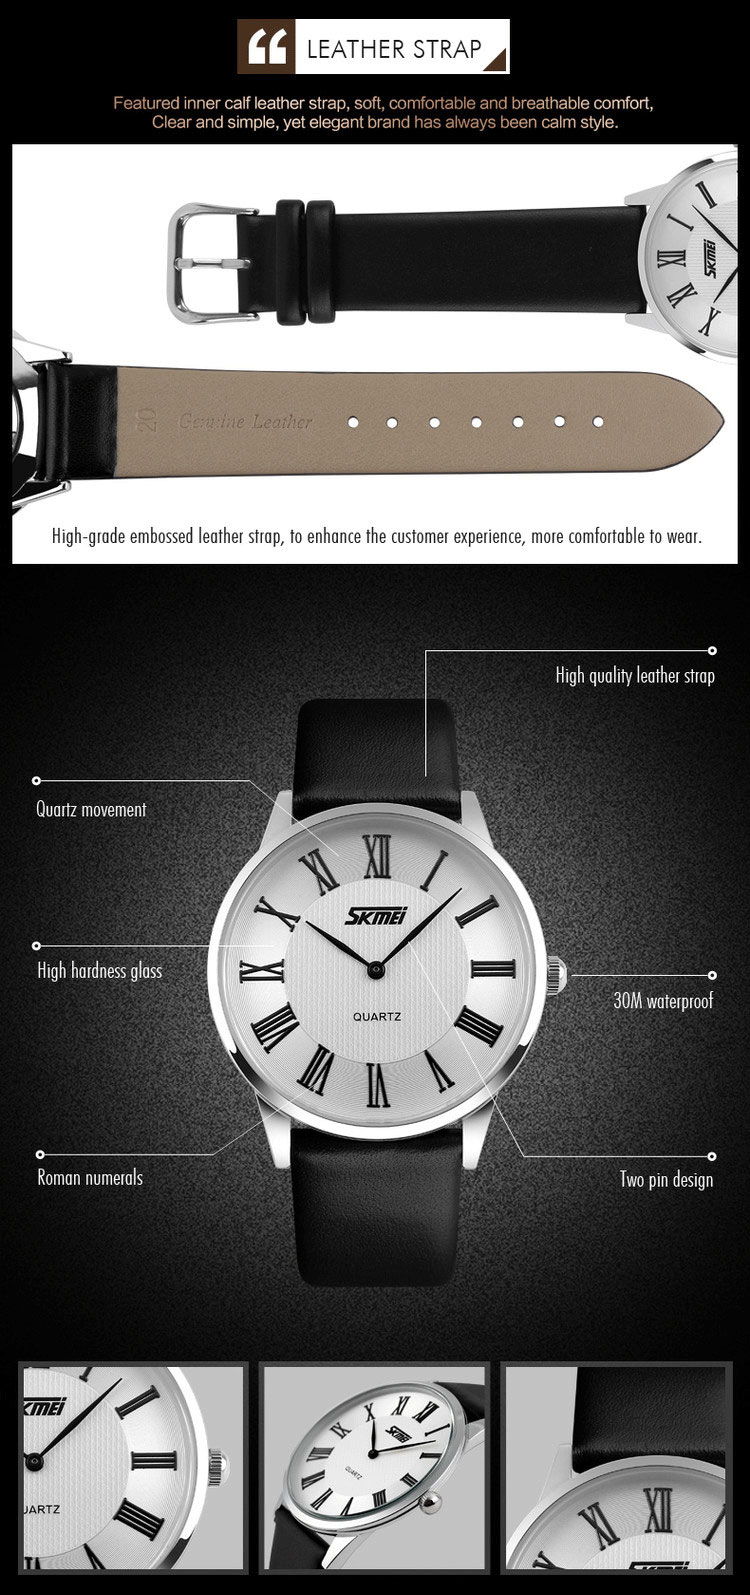 Đồng hồ đôi skmei 9092cl